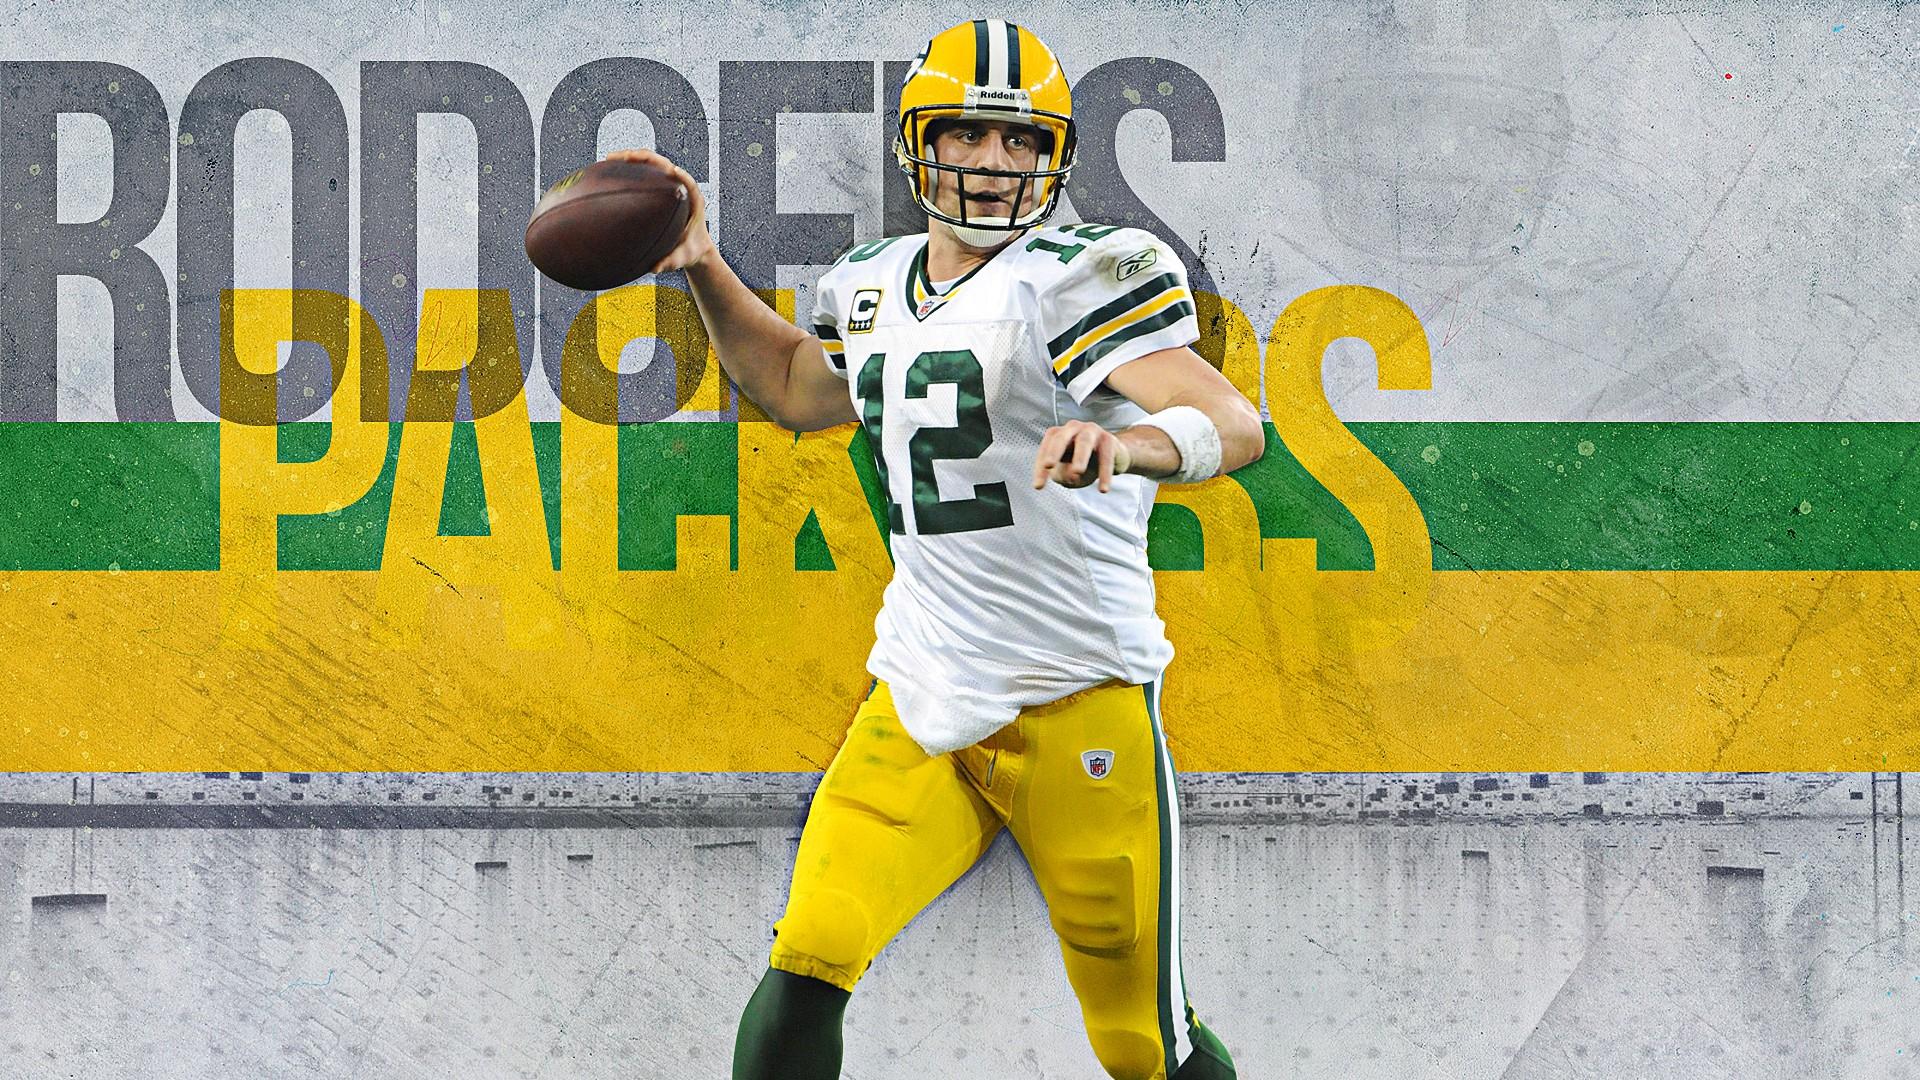 Aaron Rodgers wallpaper ·① Download free full HD ...